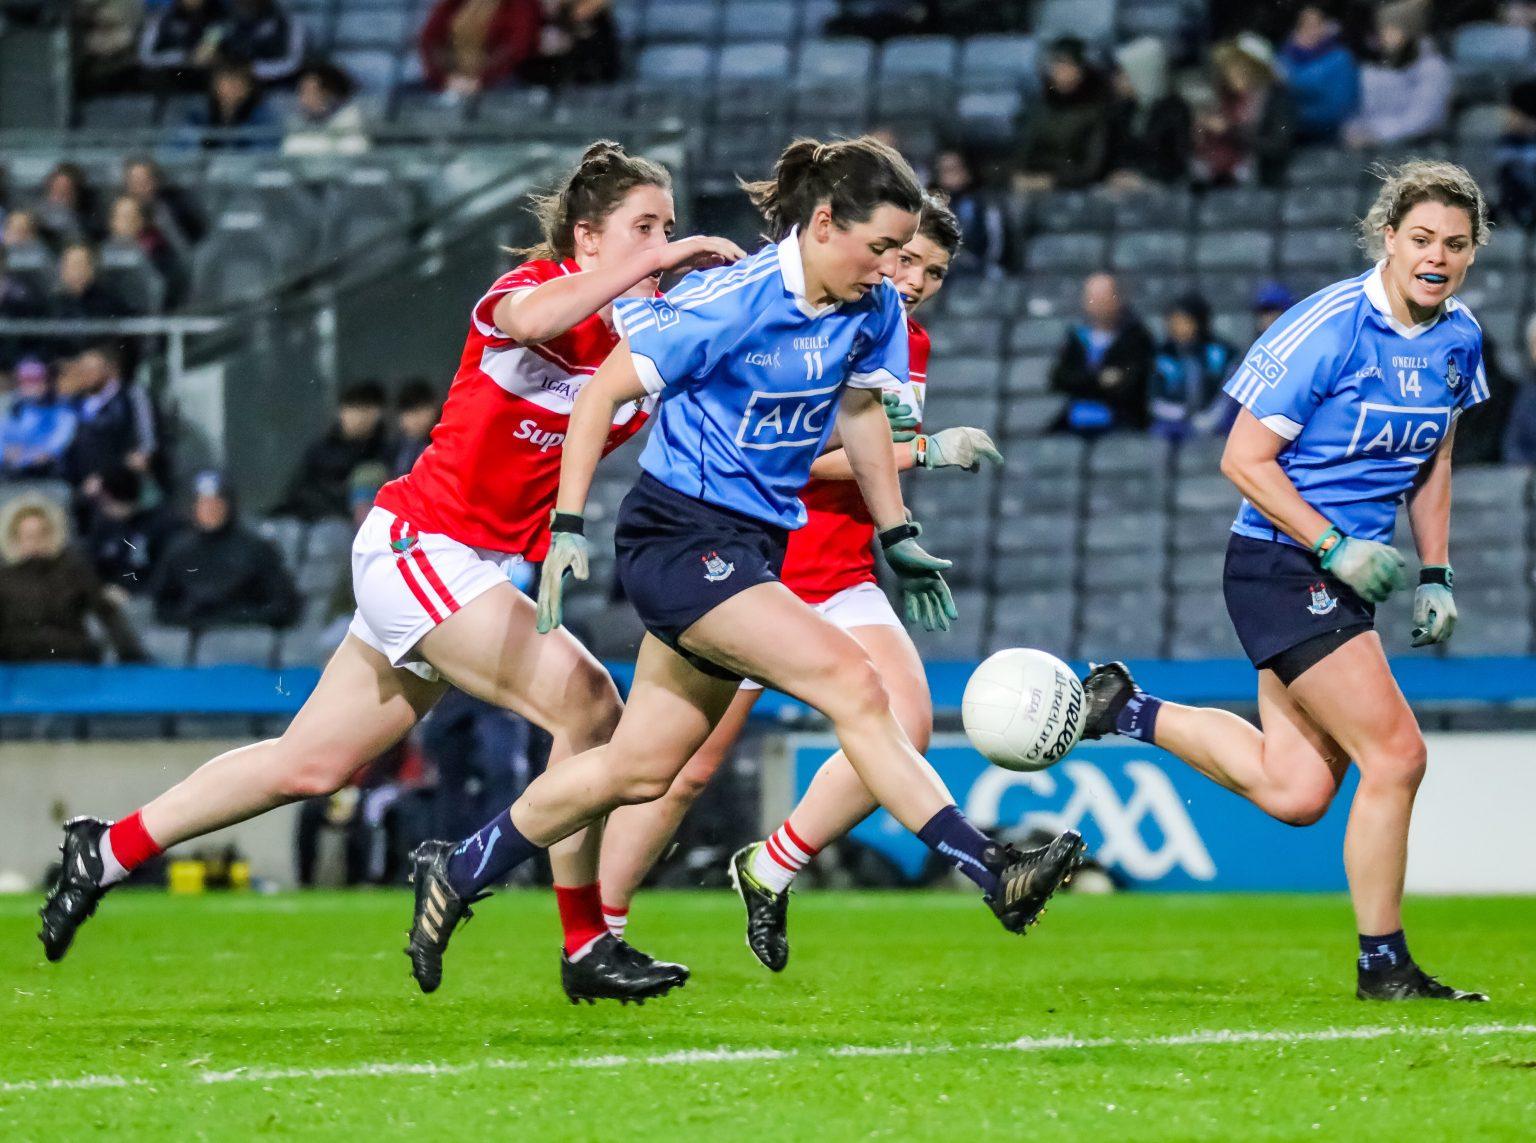 Dublin Forward Lyndsey Davey Attacking The Cork Decence